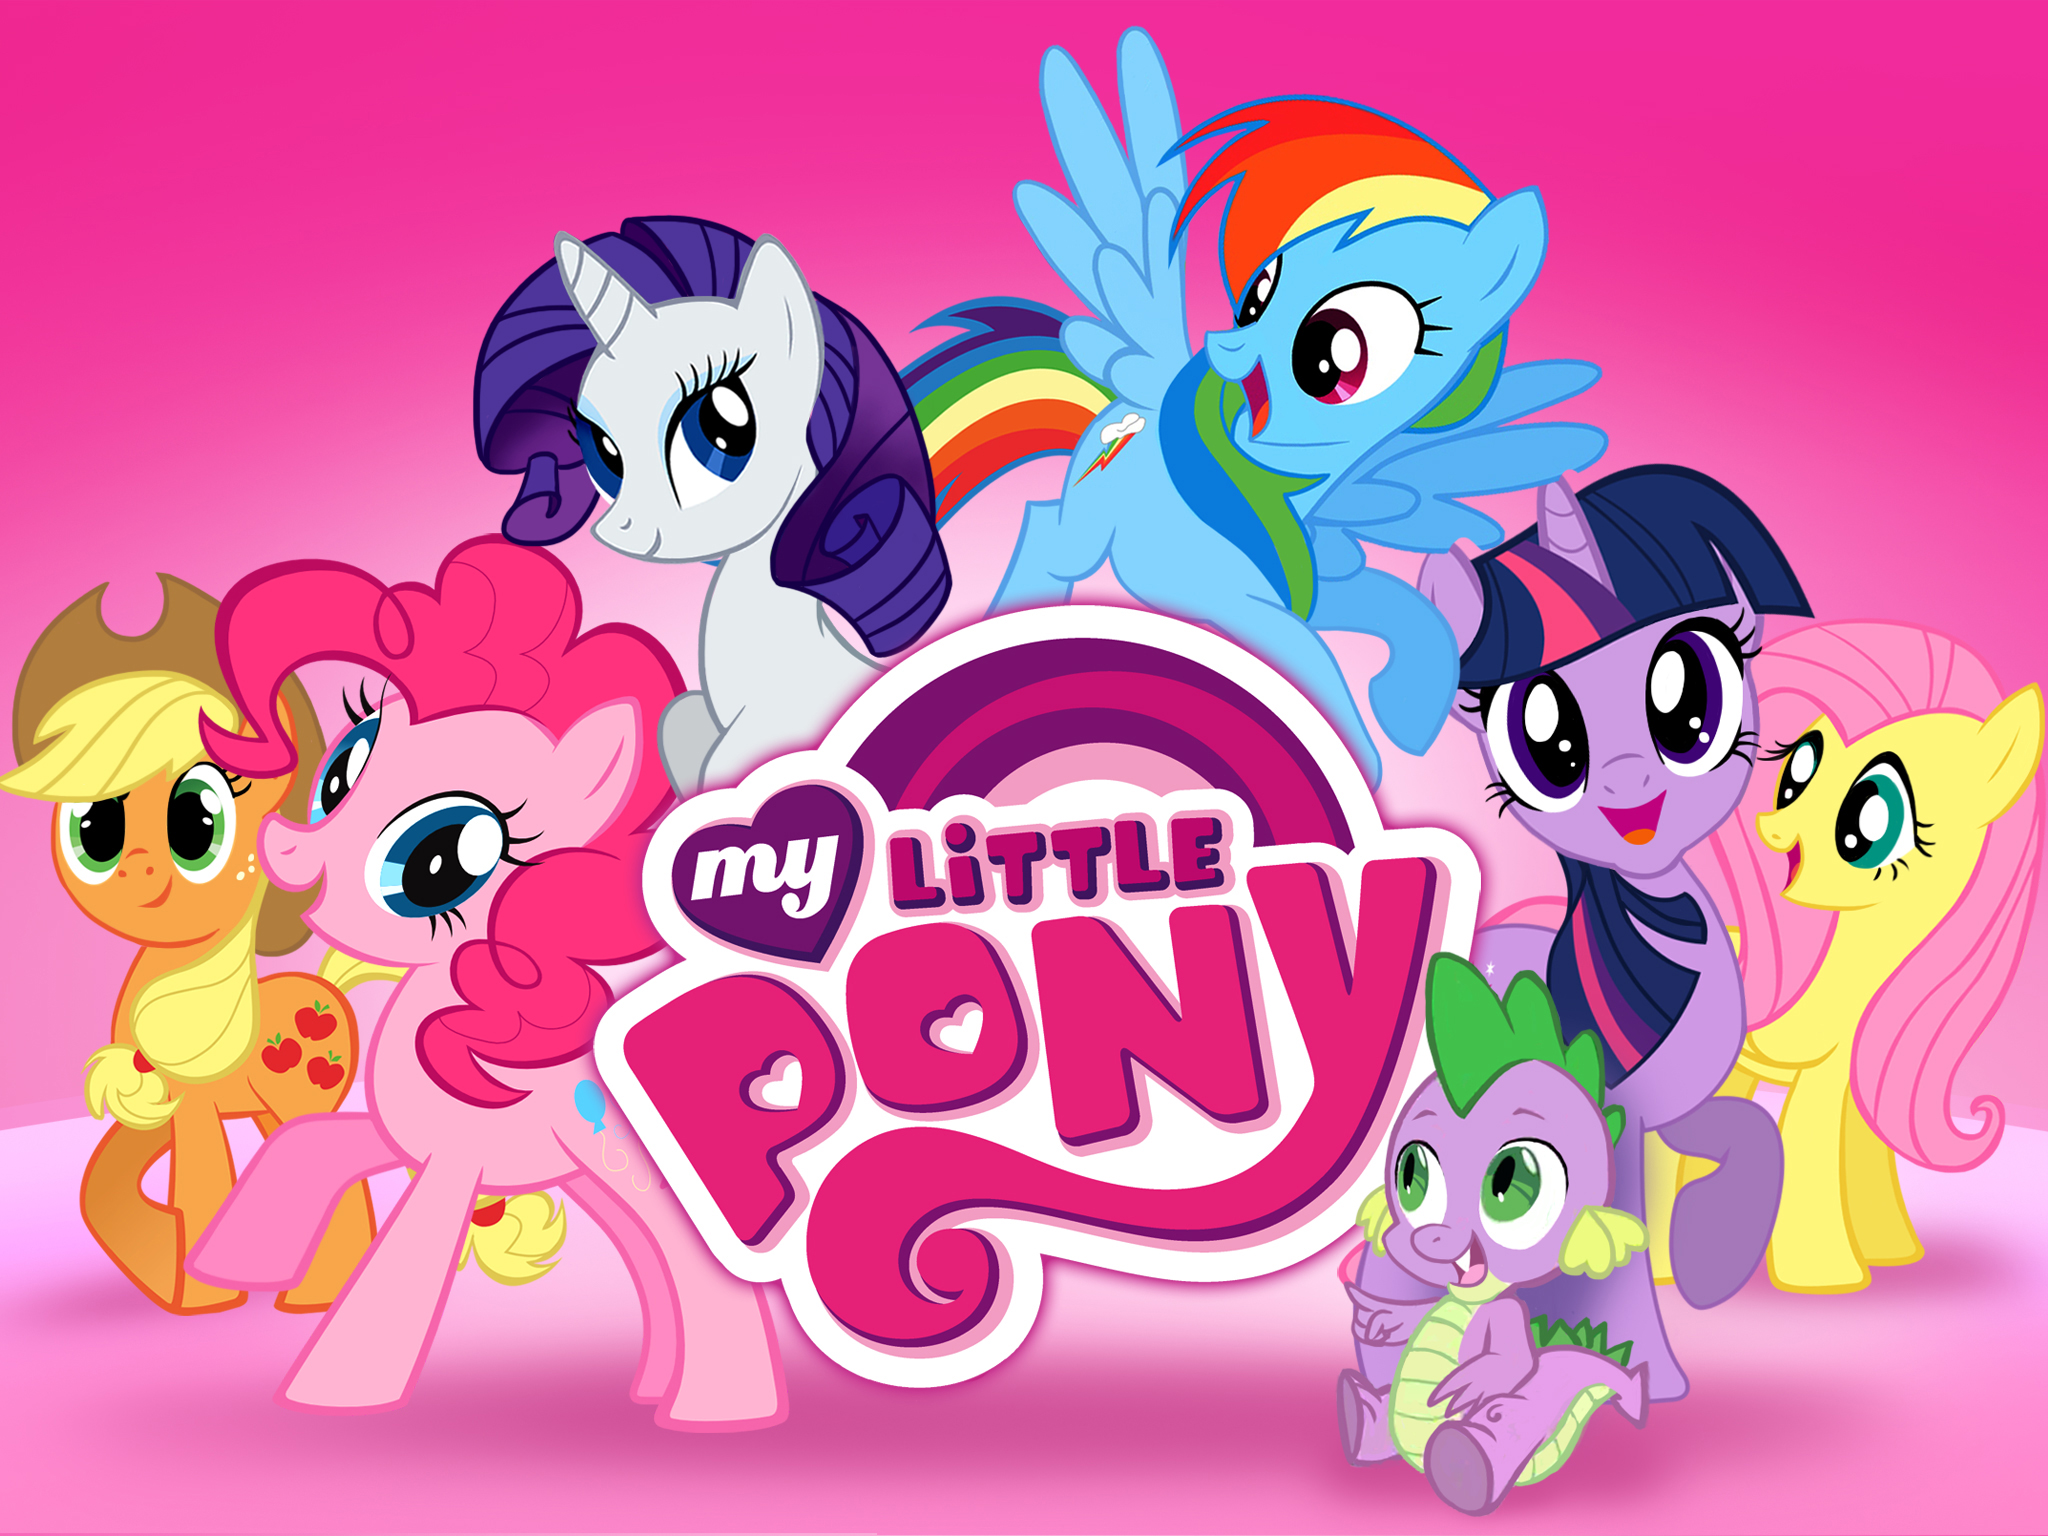 pony dating free asian dating uk